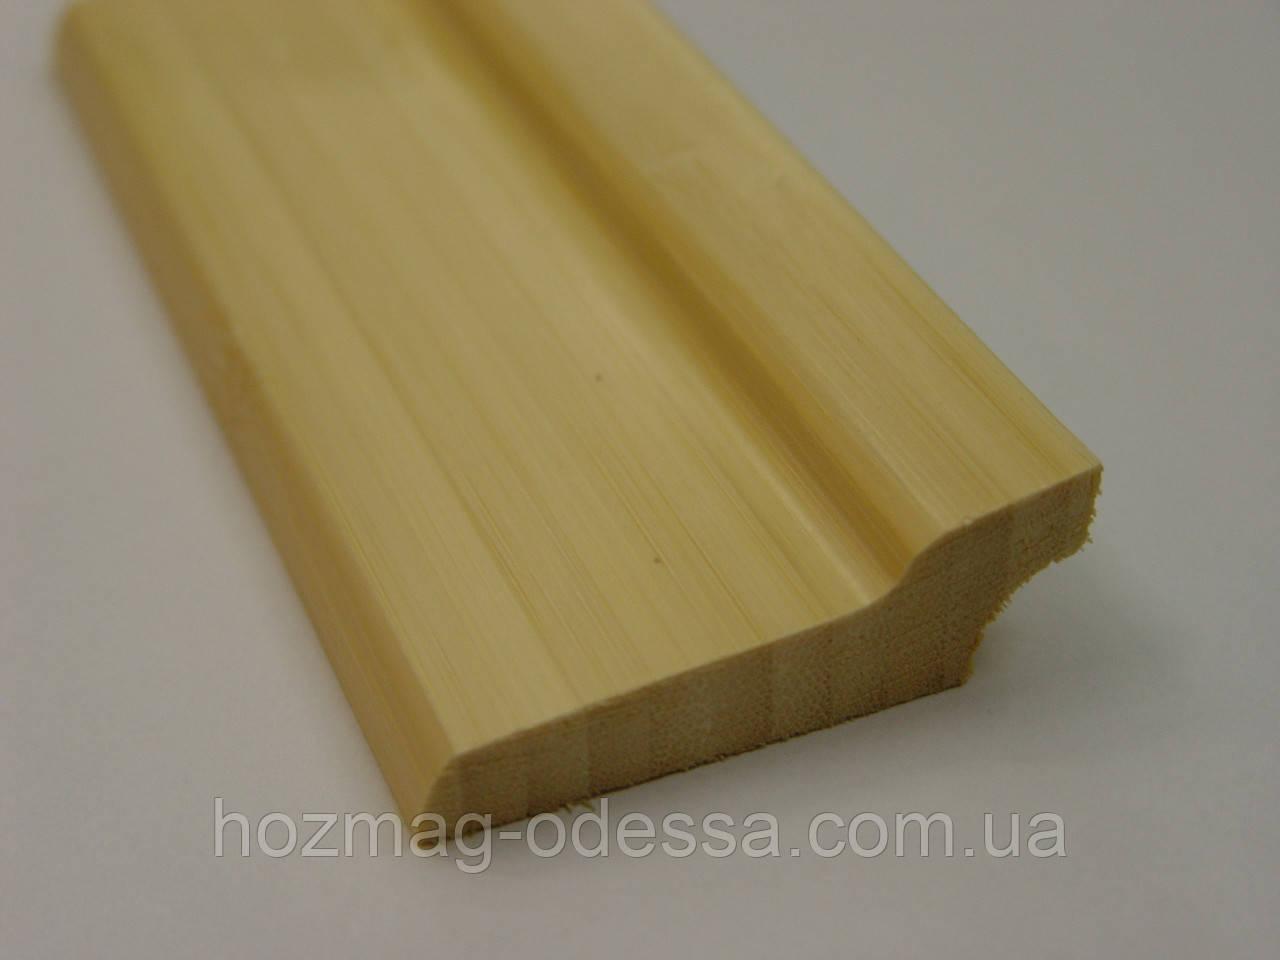 Плинтус бамбуковый светло-бежевый